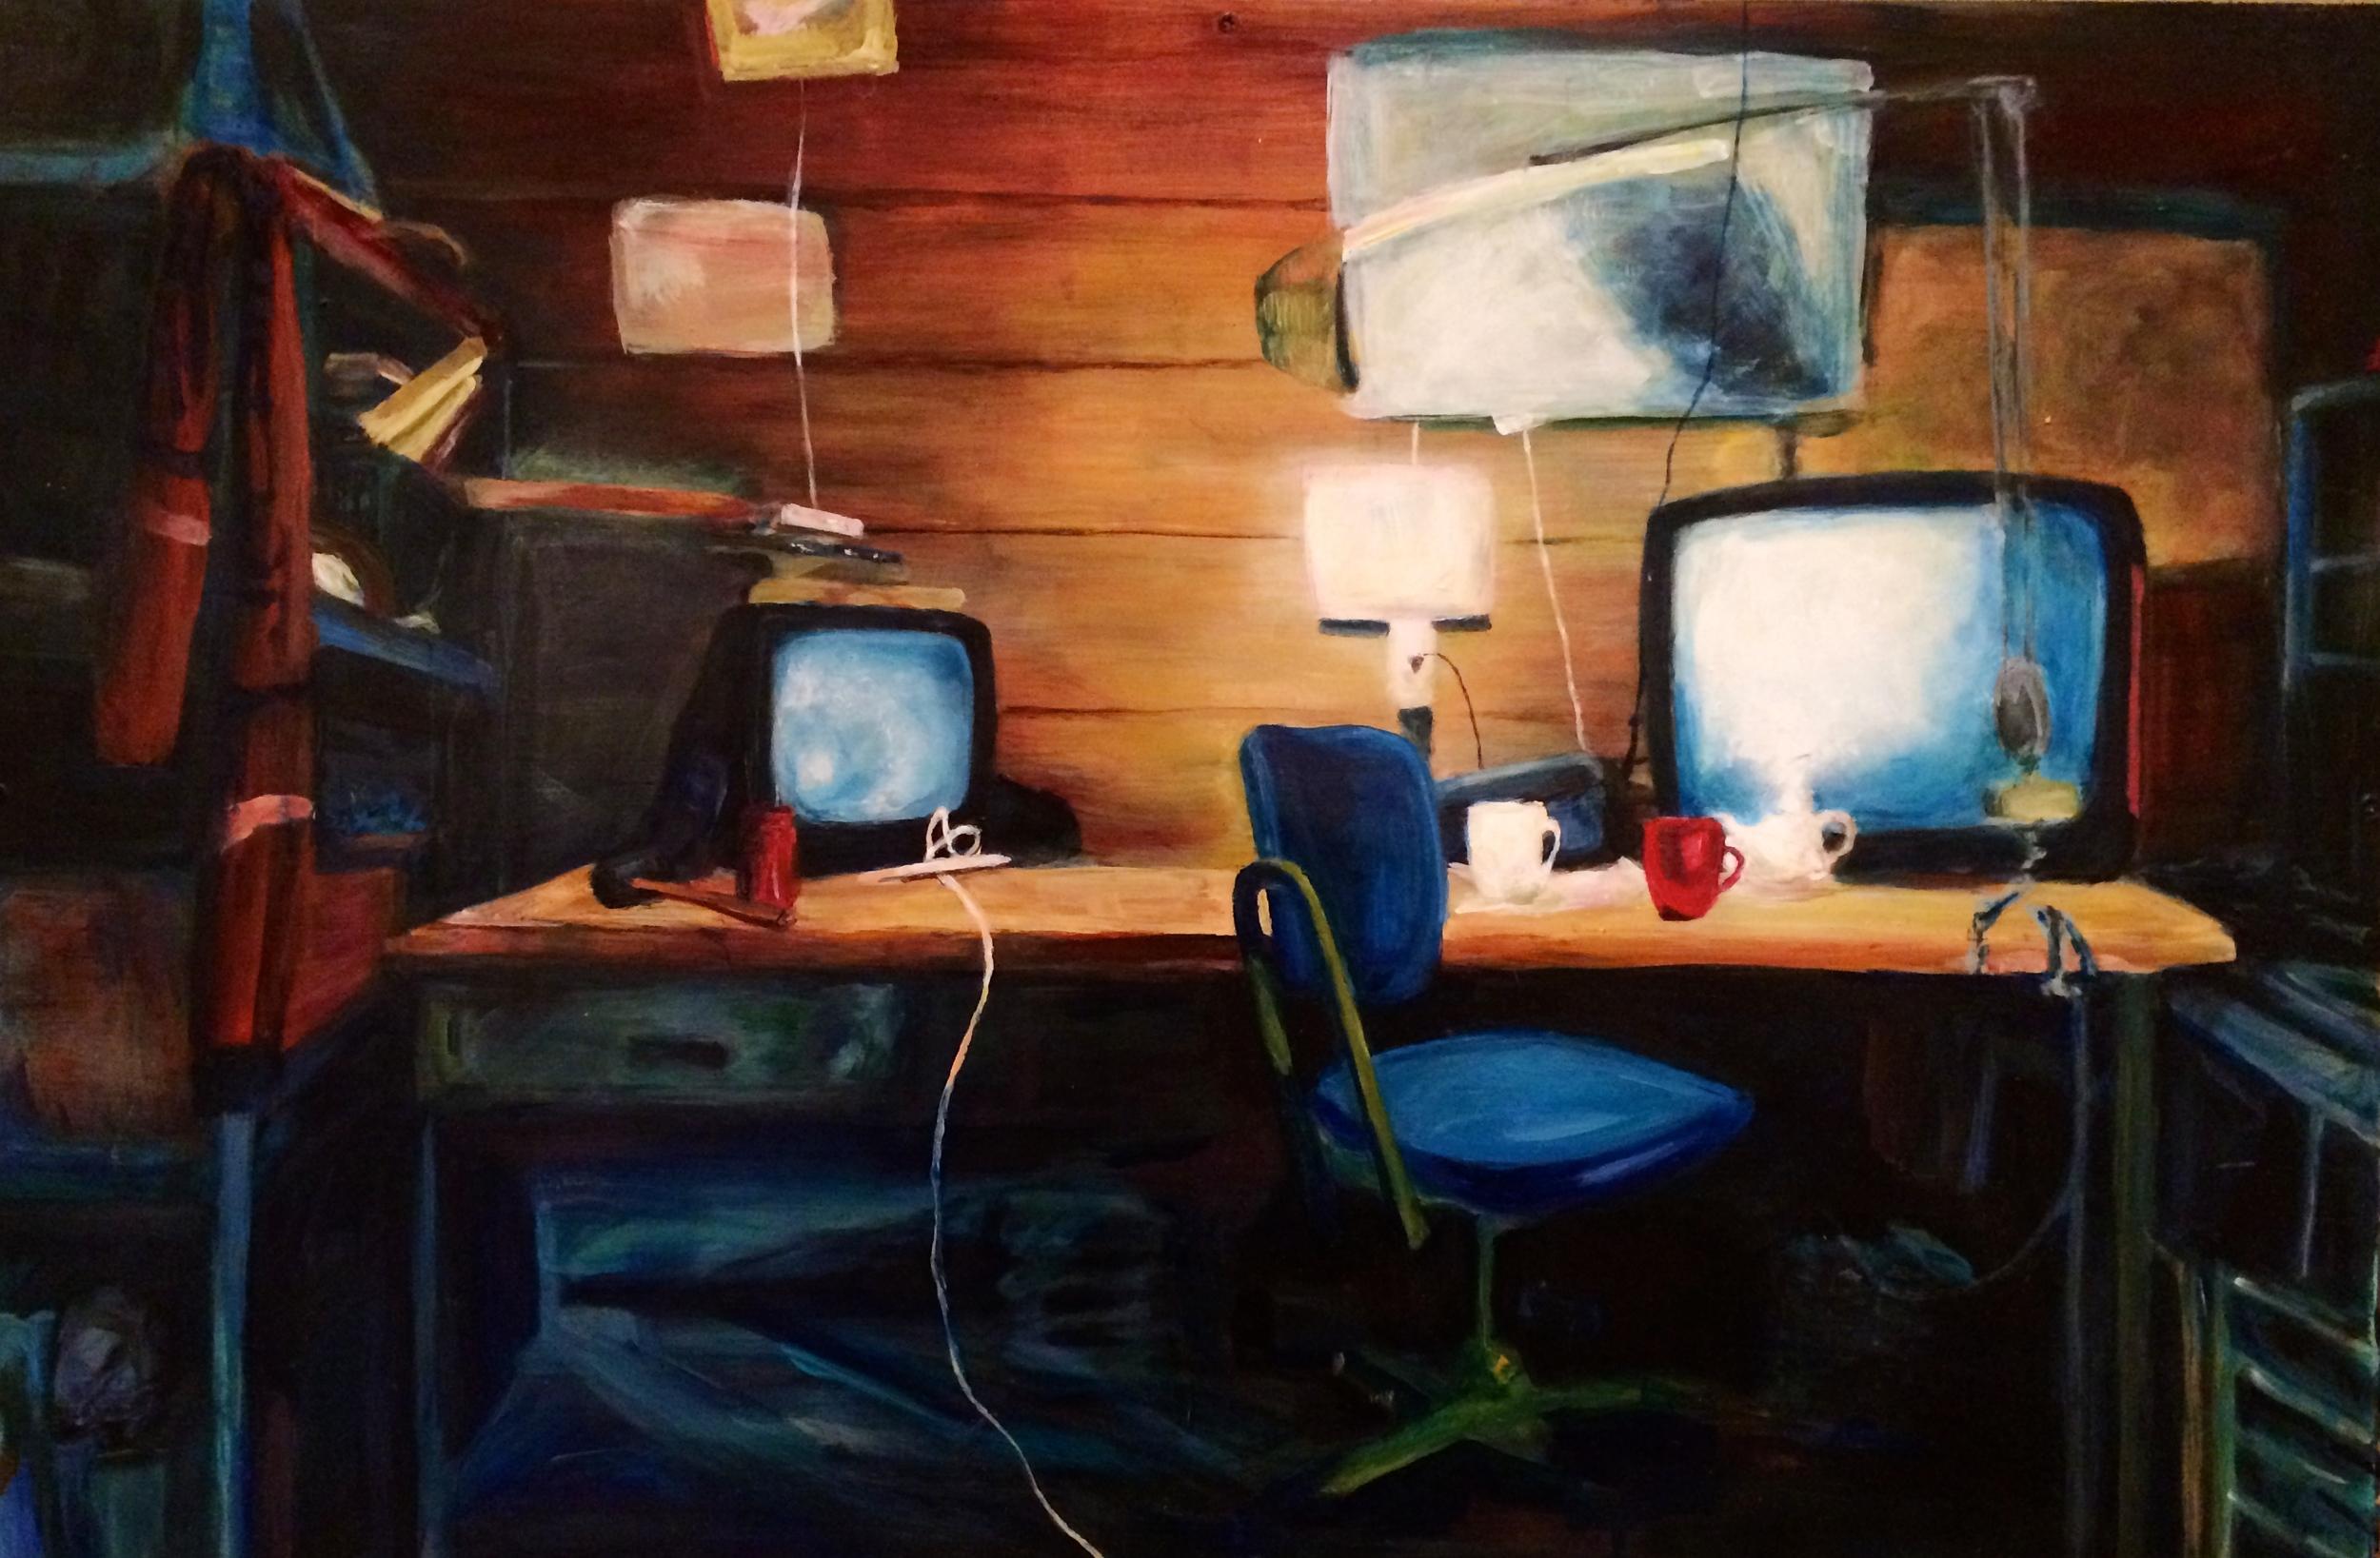 His Desk (2012) 3' x 4' oil on wood